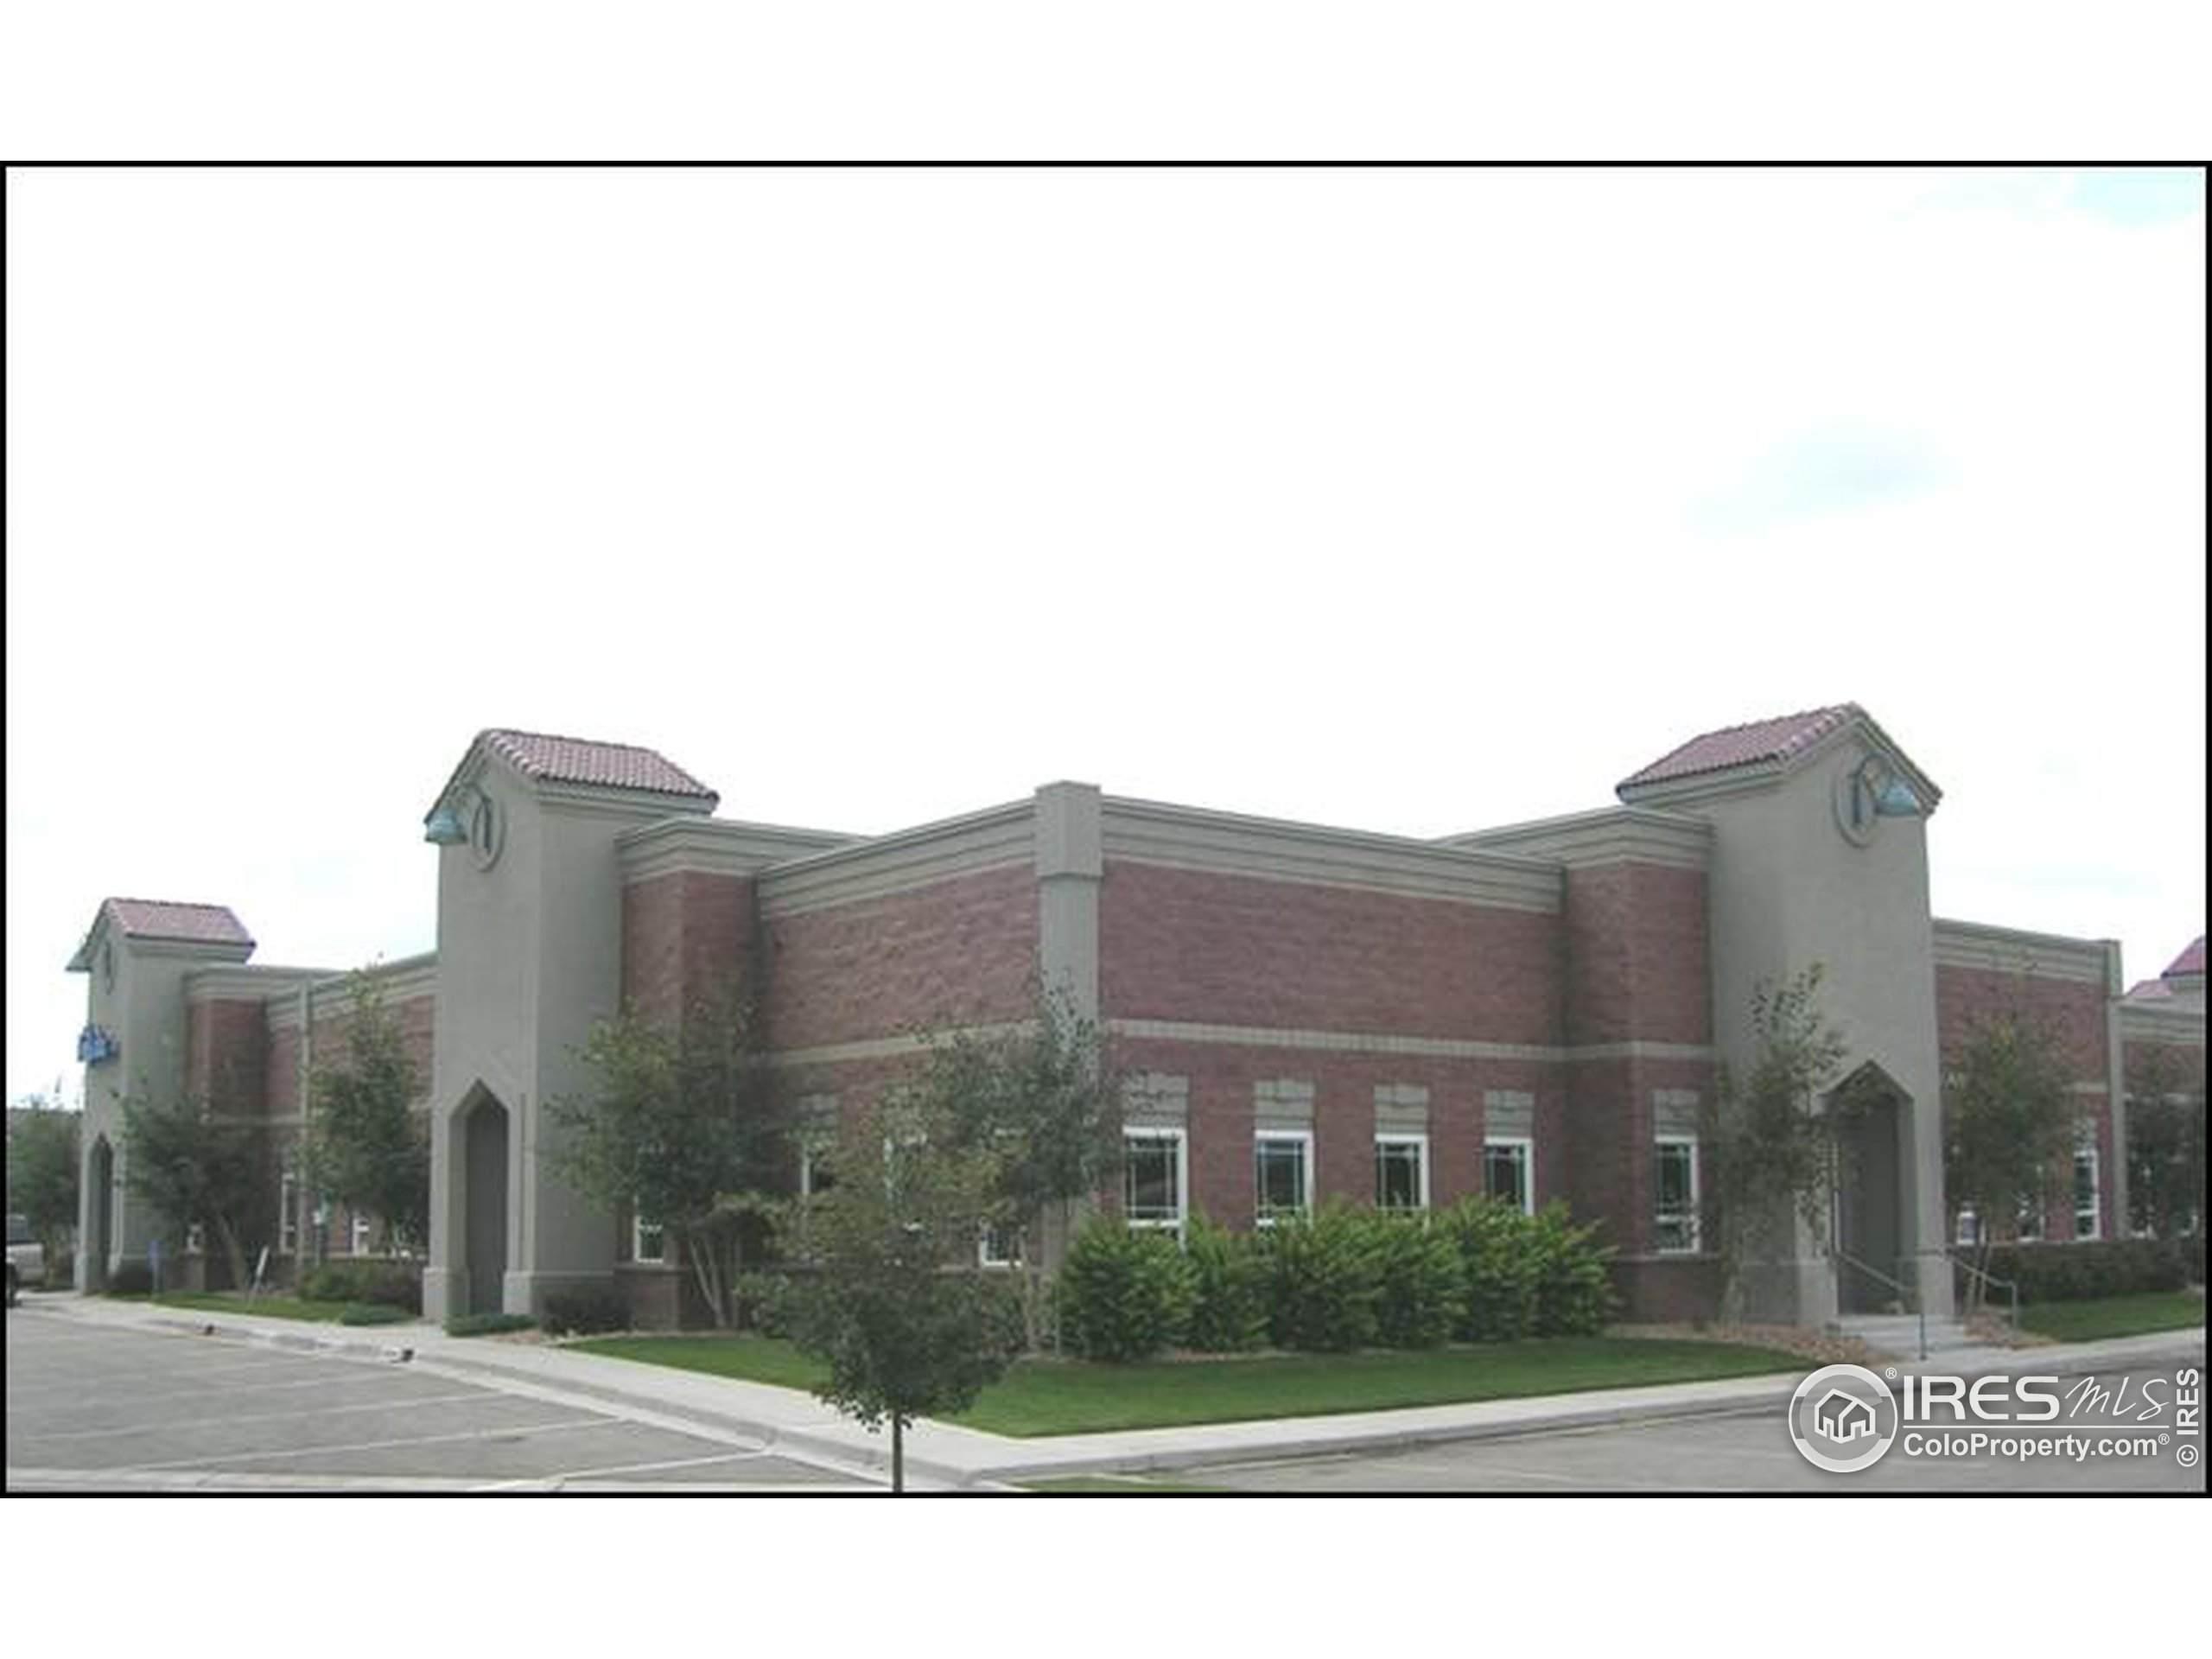 931 Pinon Ct, Longmont, CO 80504 (MLS #891056) :: Hub Real Estate